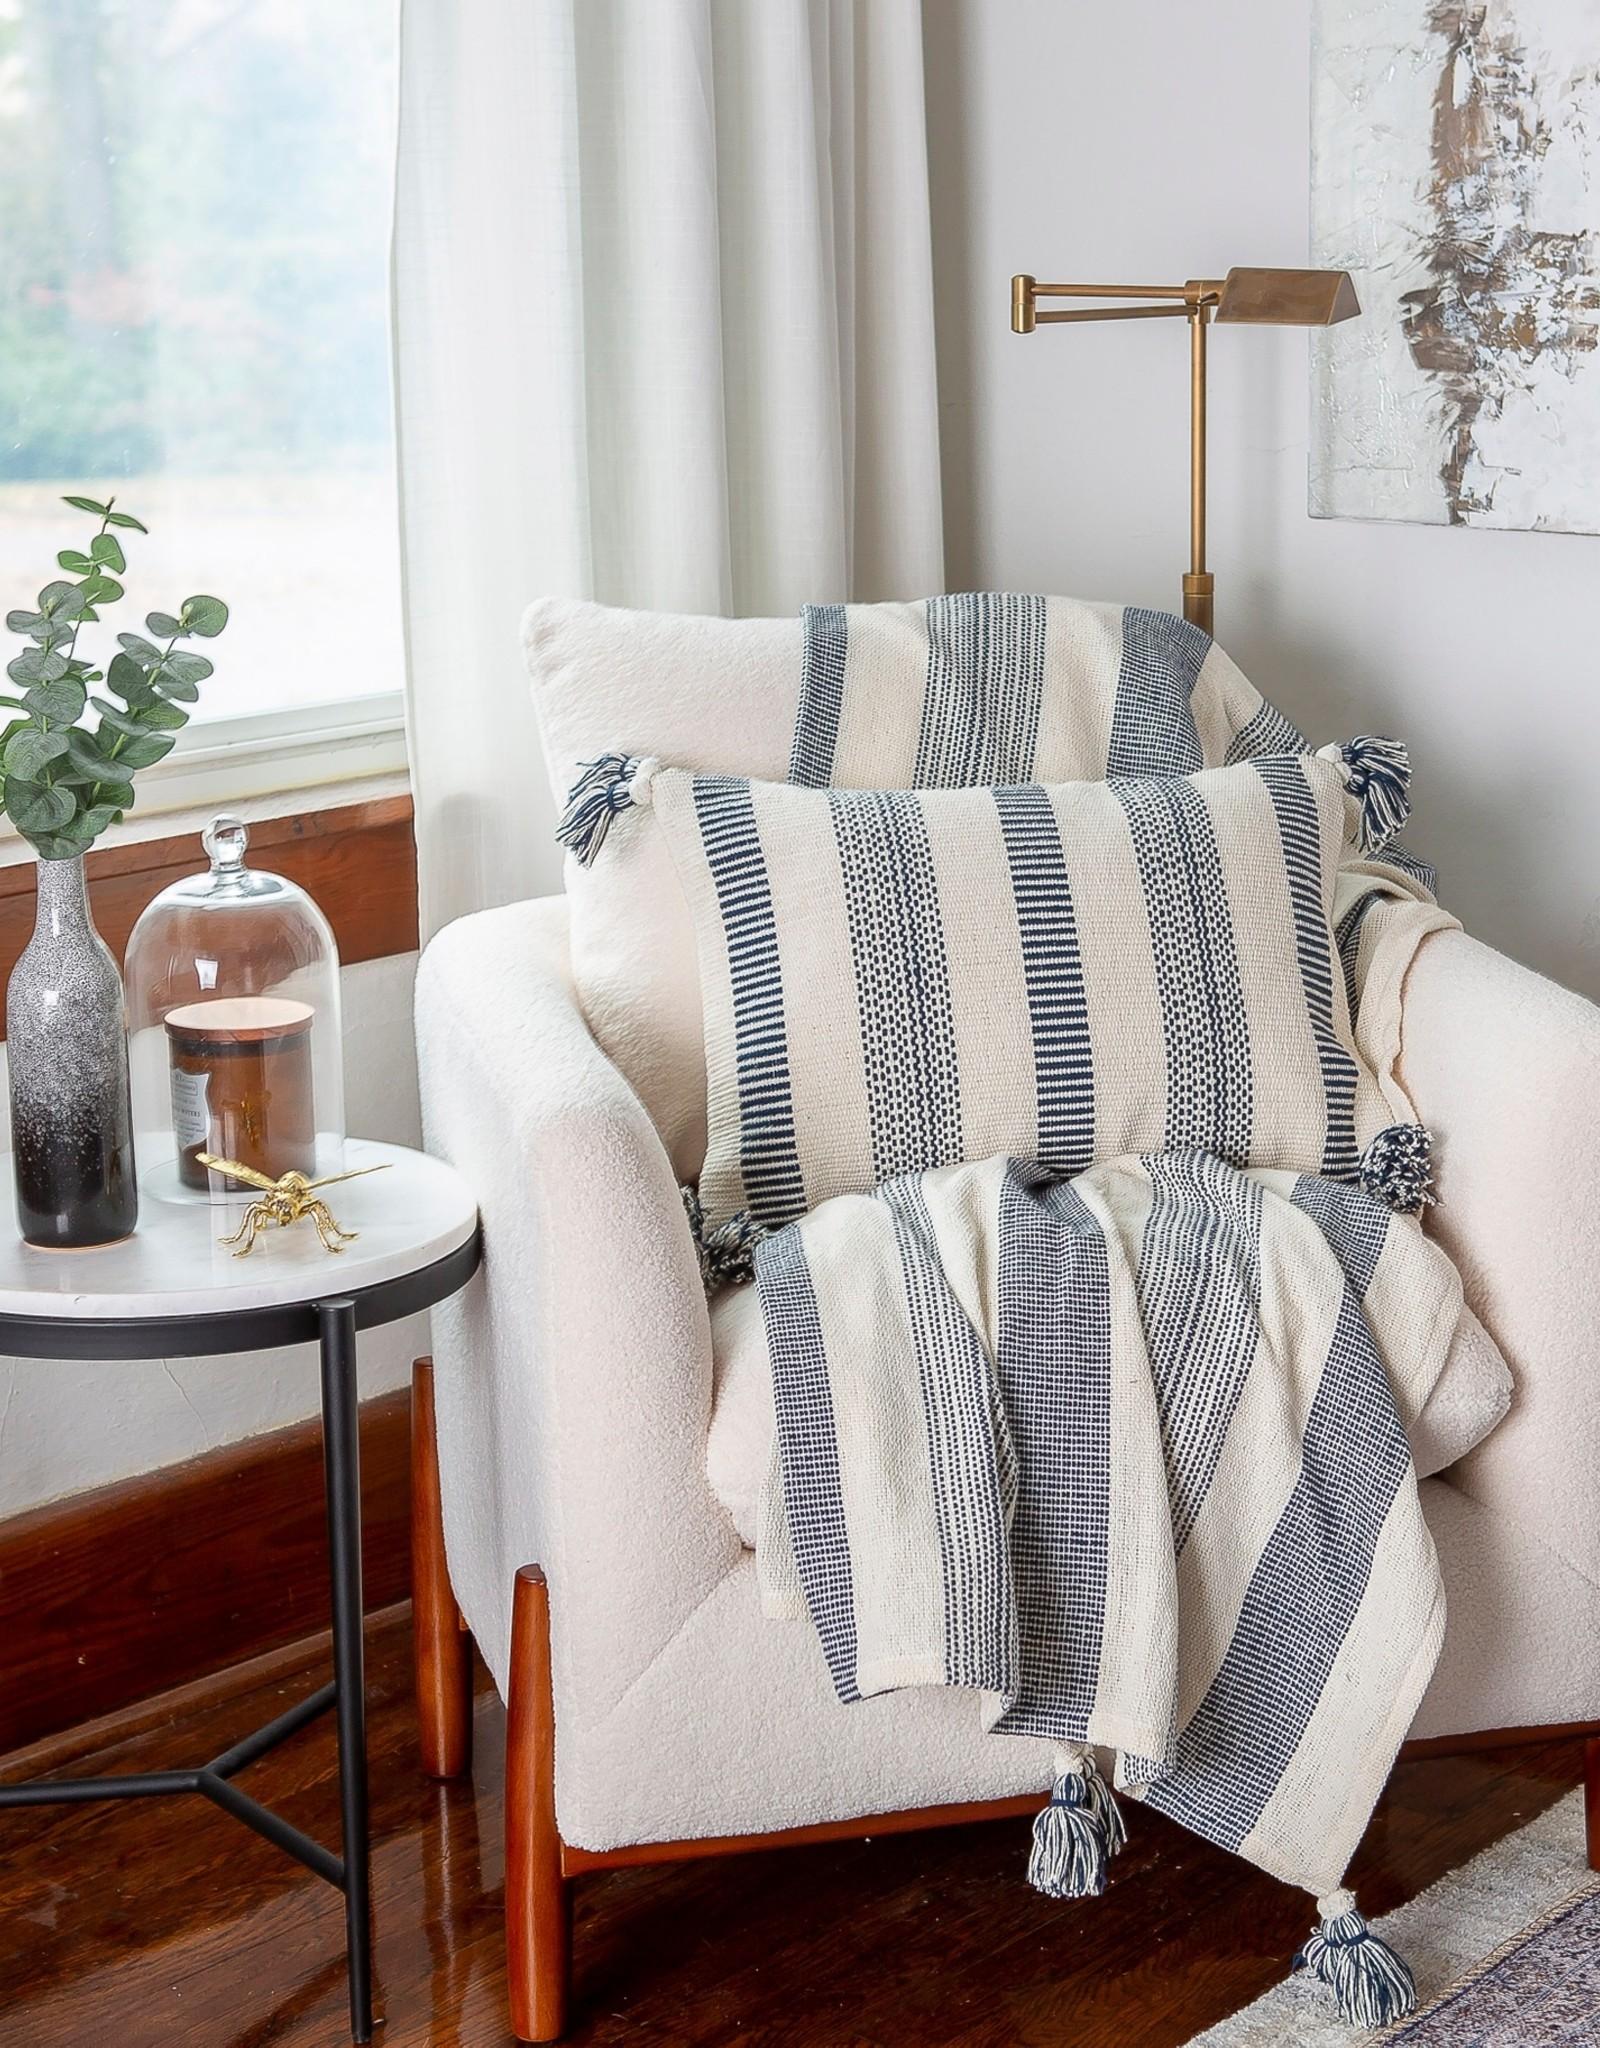 Peking Handcraft Throw Blanket - Barett Ink